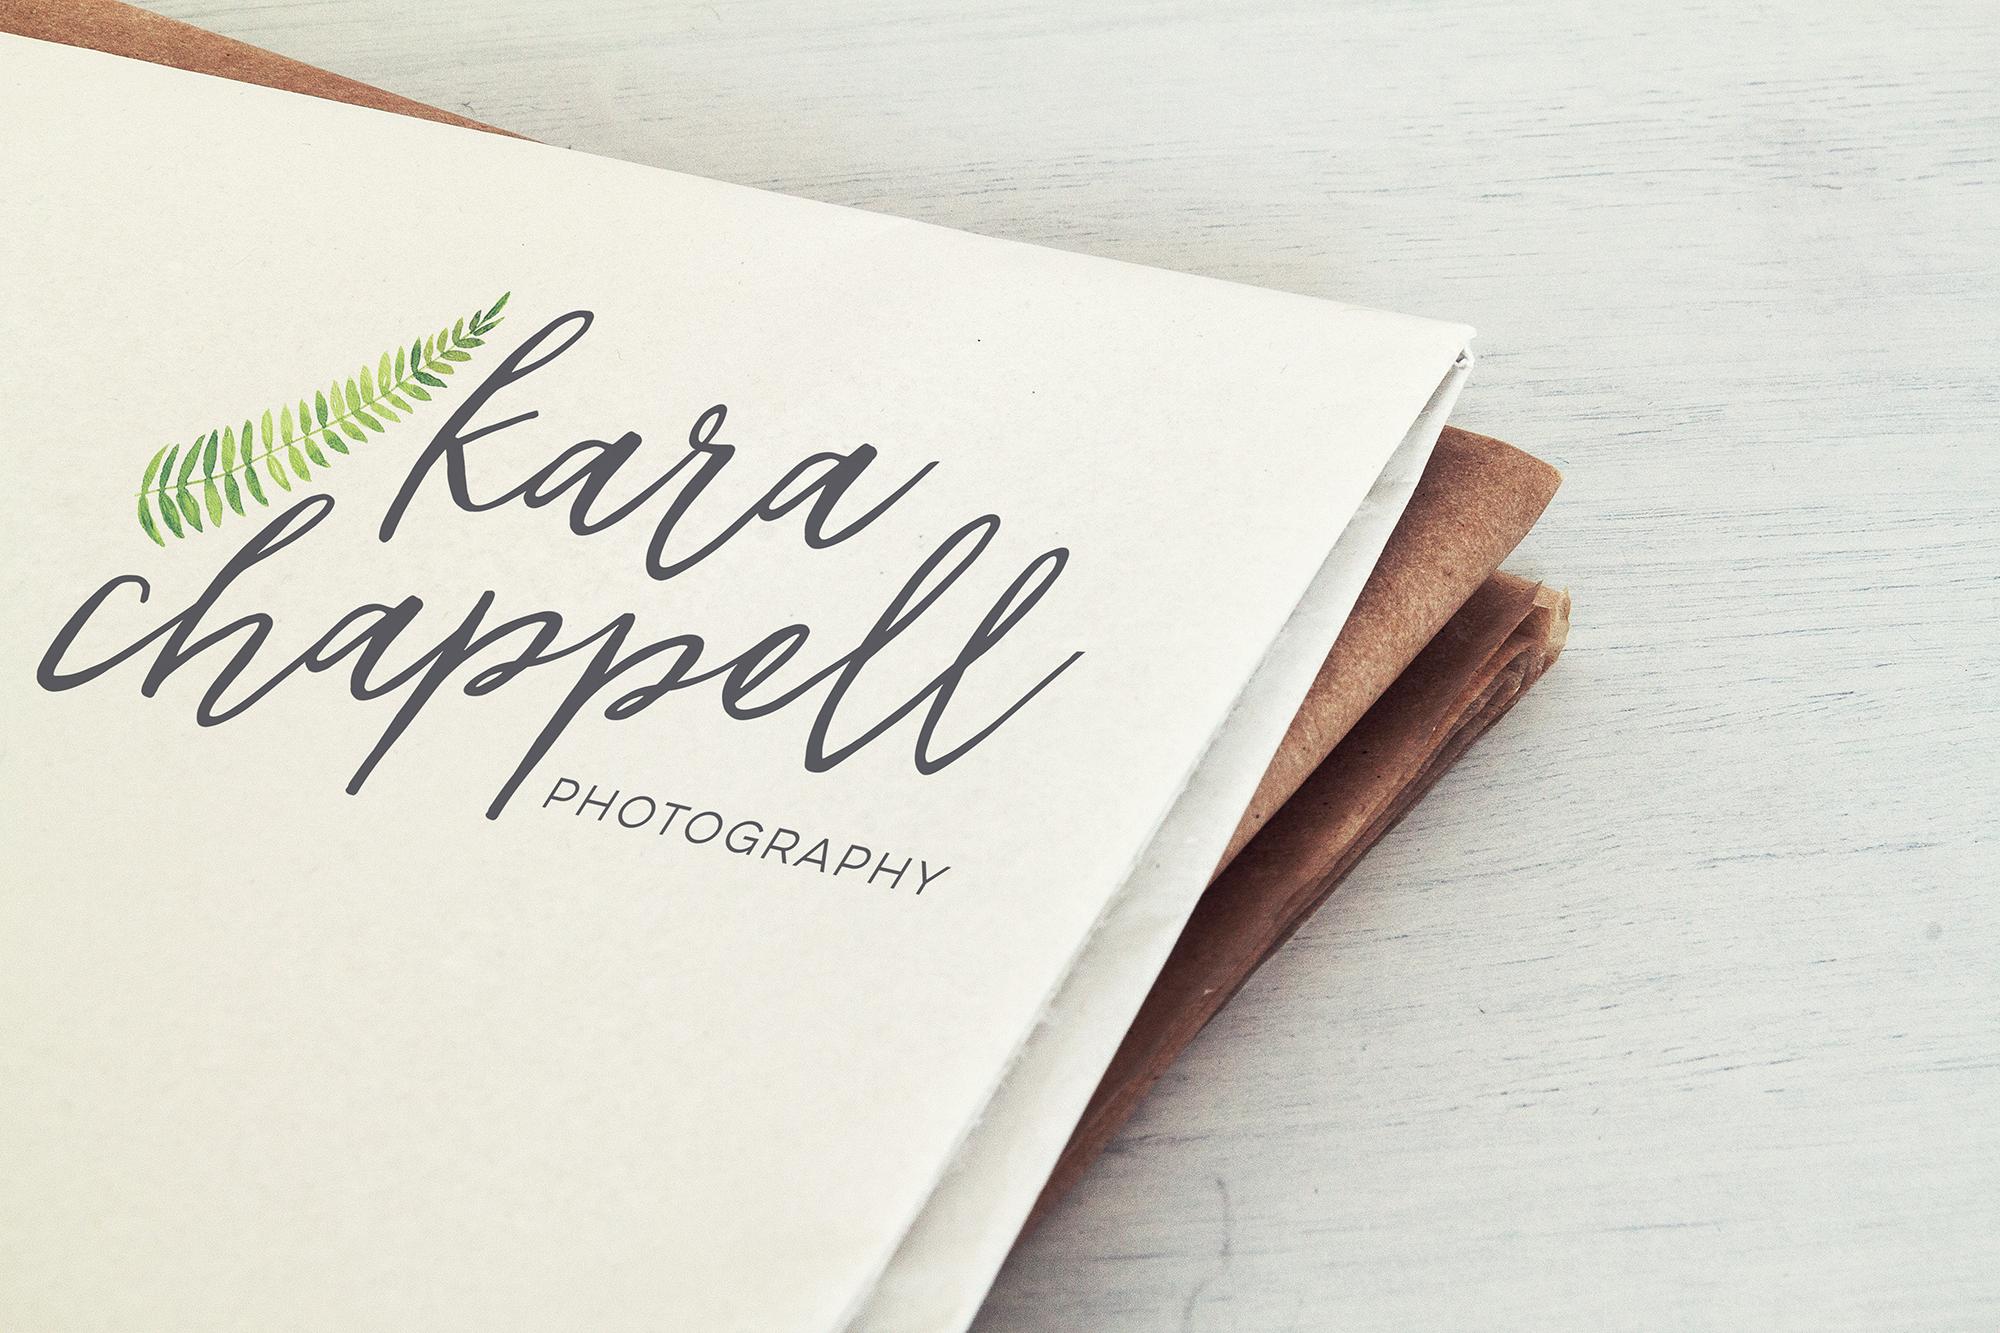 Kara Chappell Photography by Leesa Dykstra Designs 3.png